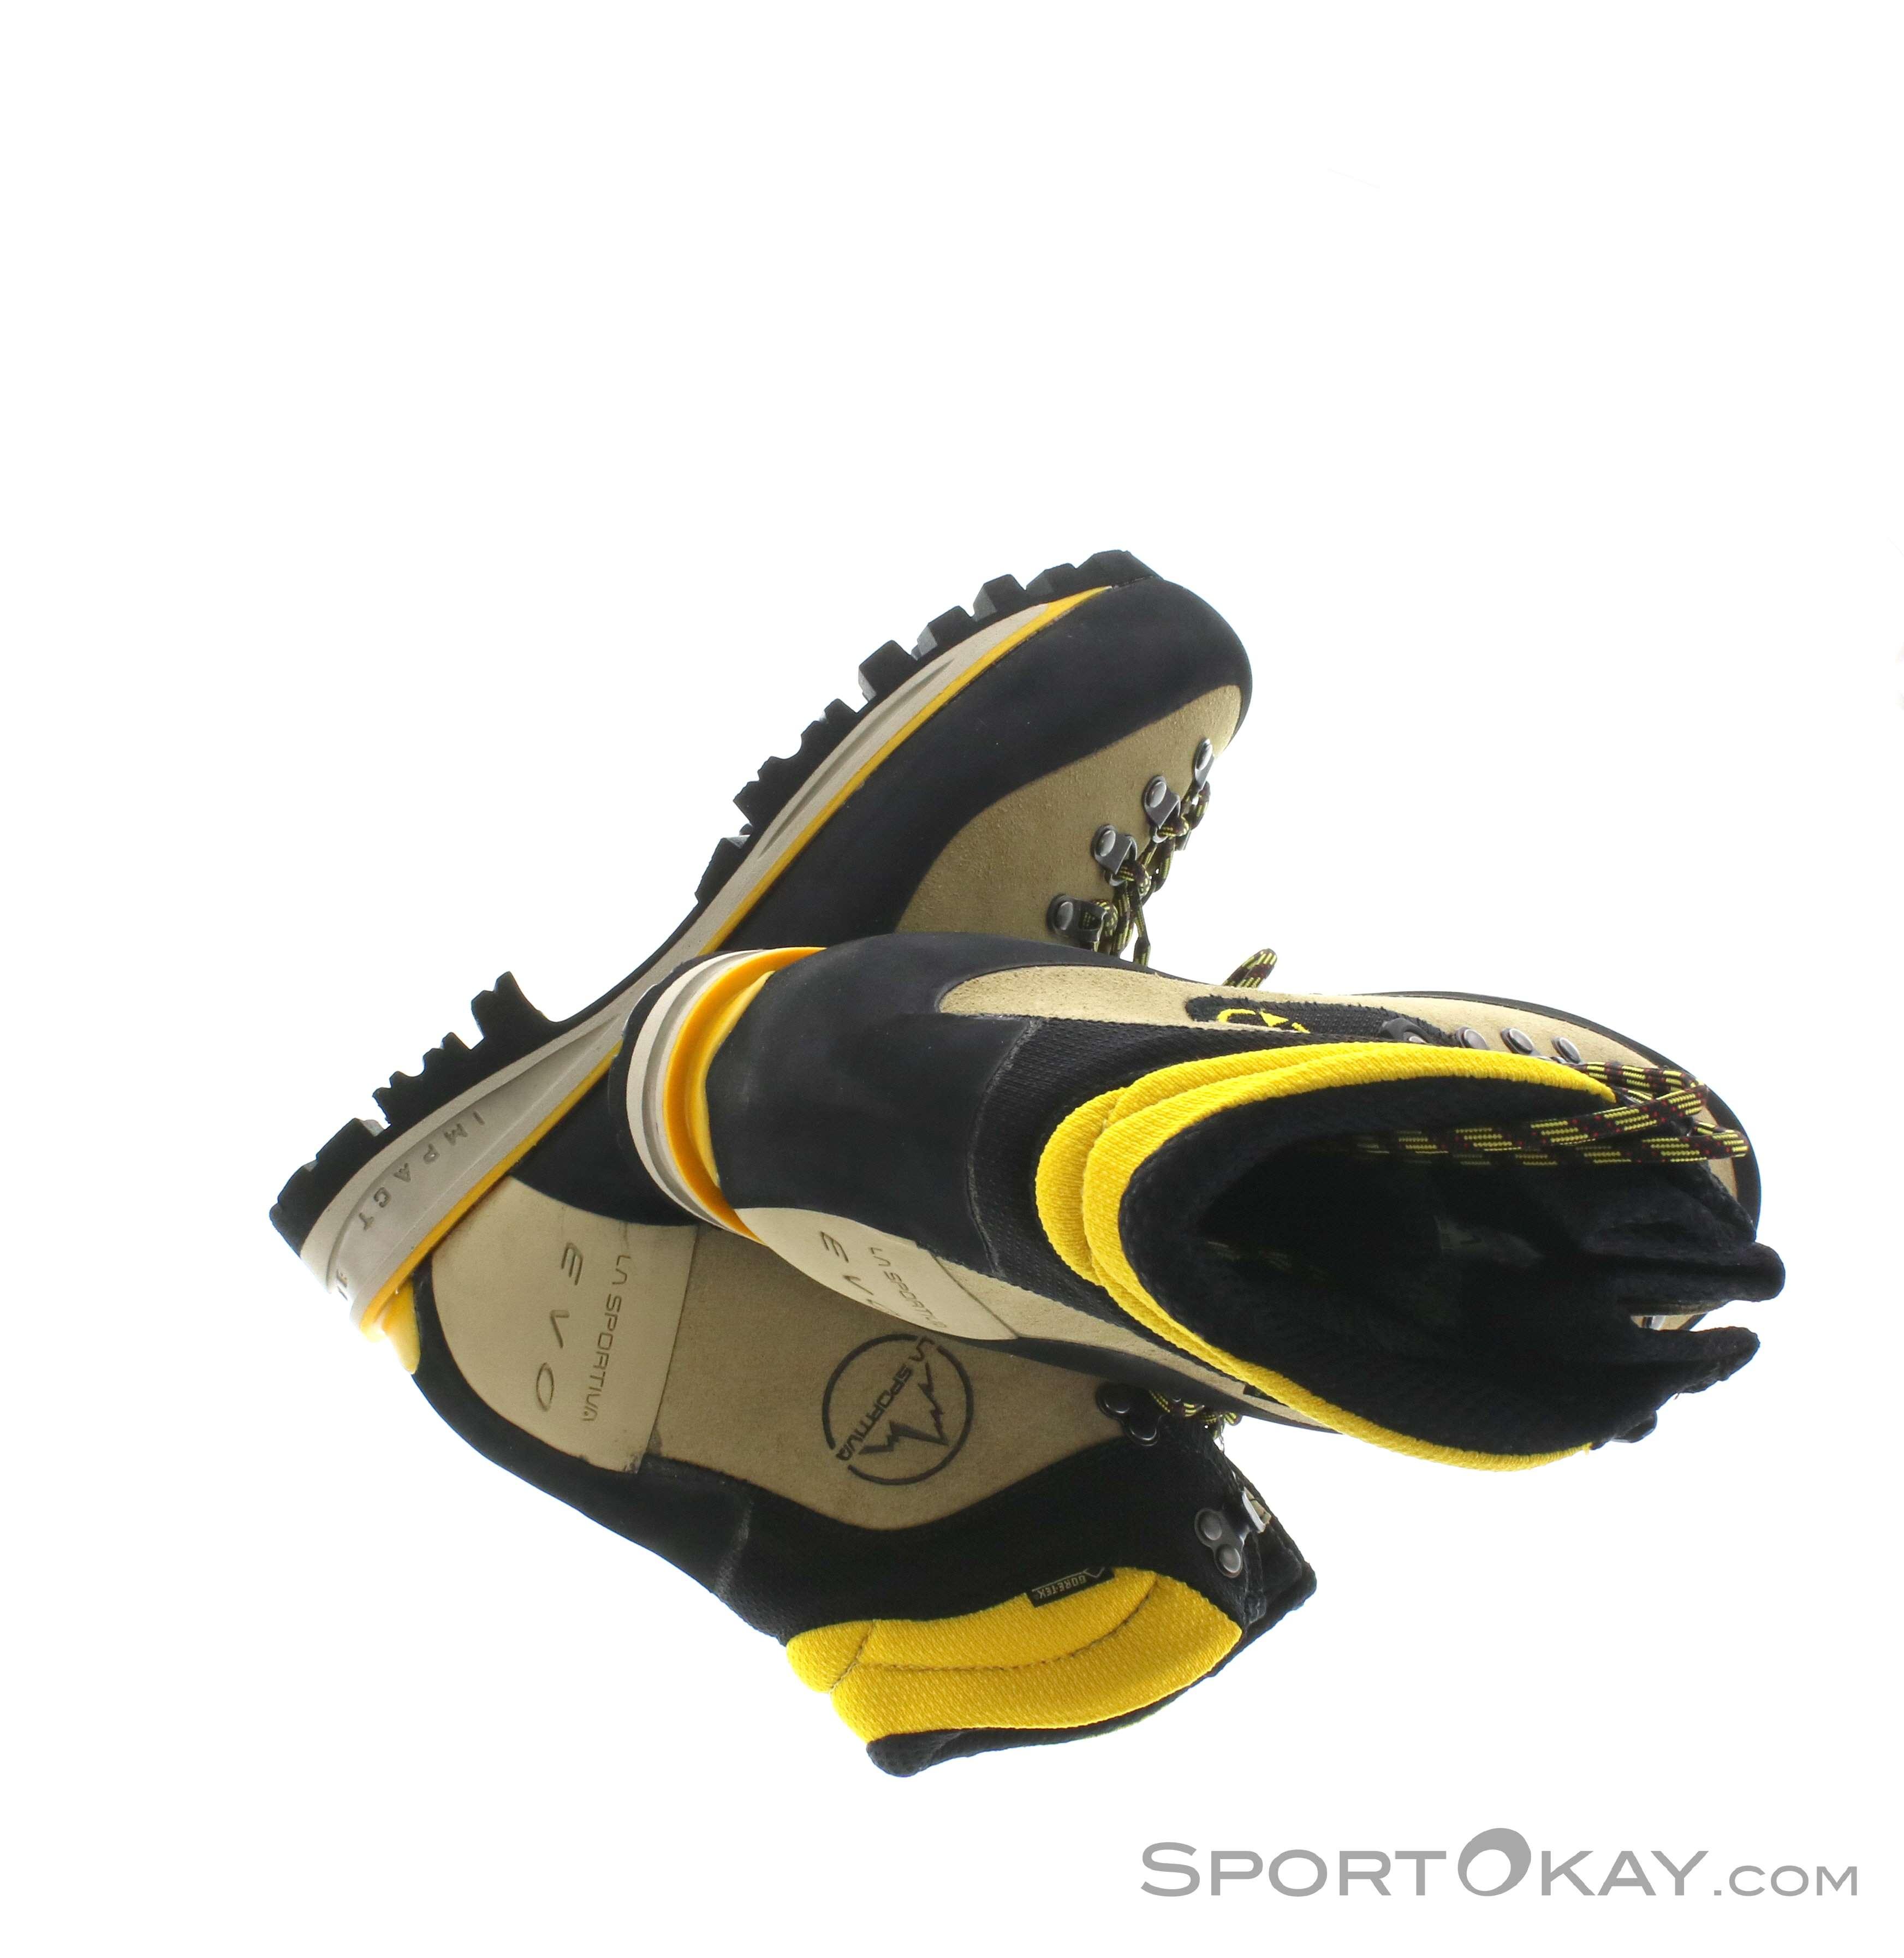 La Sportiva Nepal Trek EVO Scarpe da Montagna Gore-Tex - Scarpe da ... 75c95920366